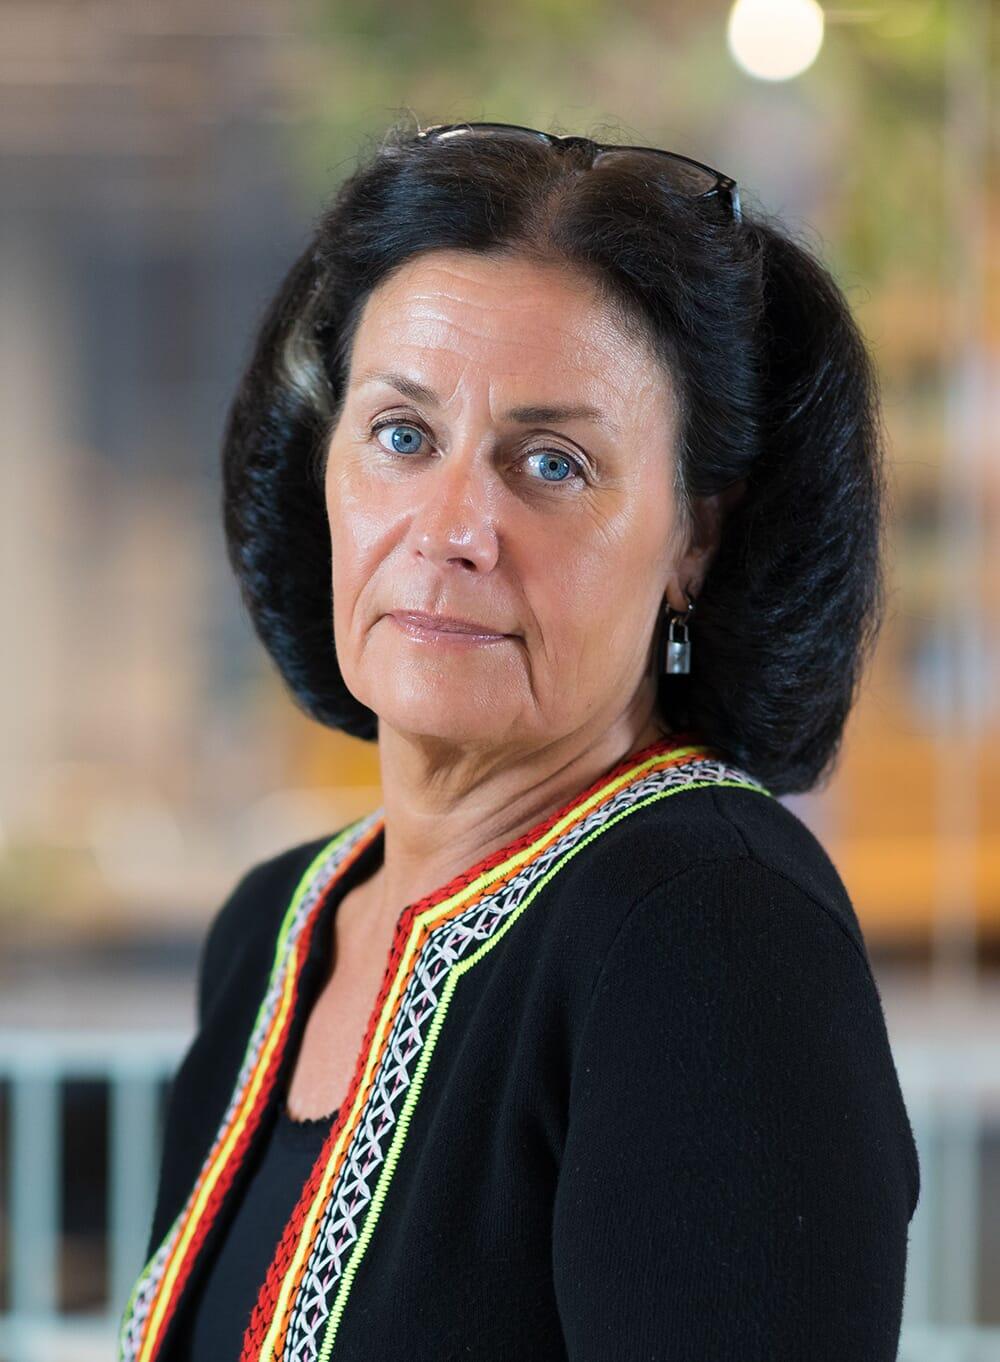 Ulrika Forsberg